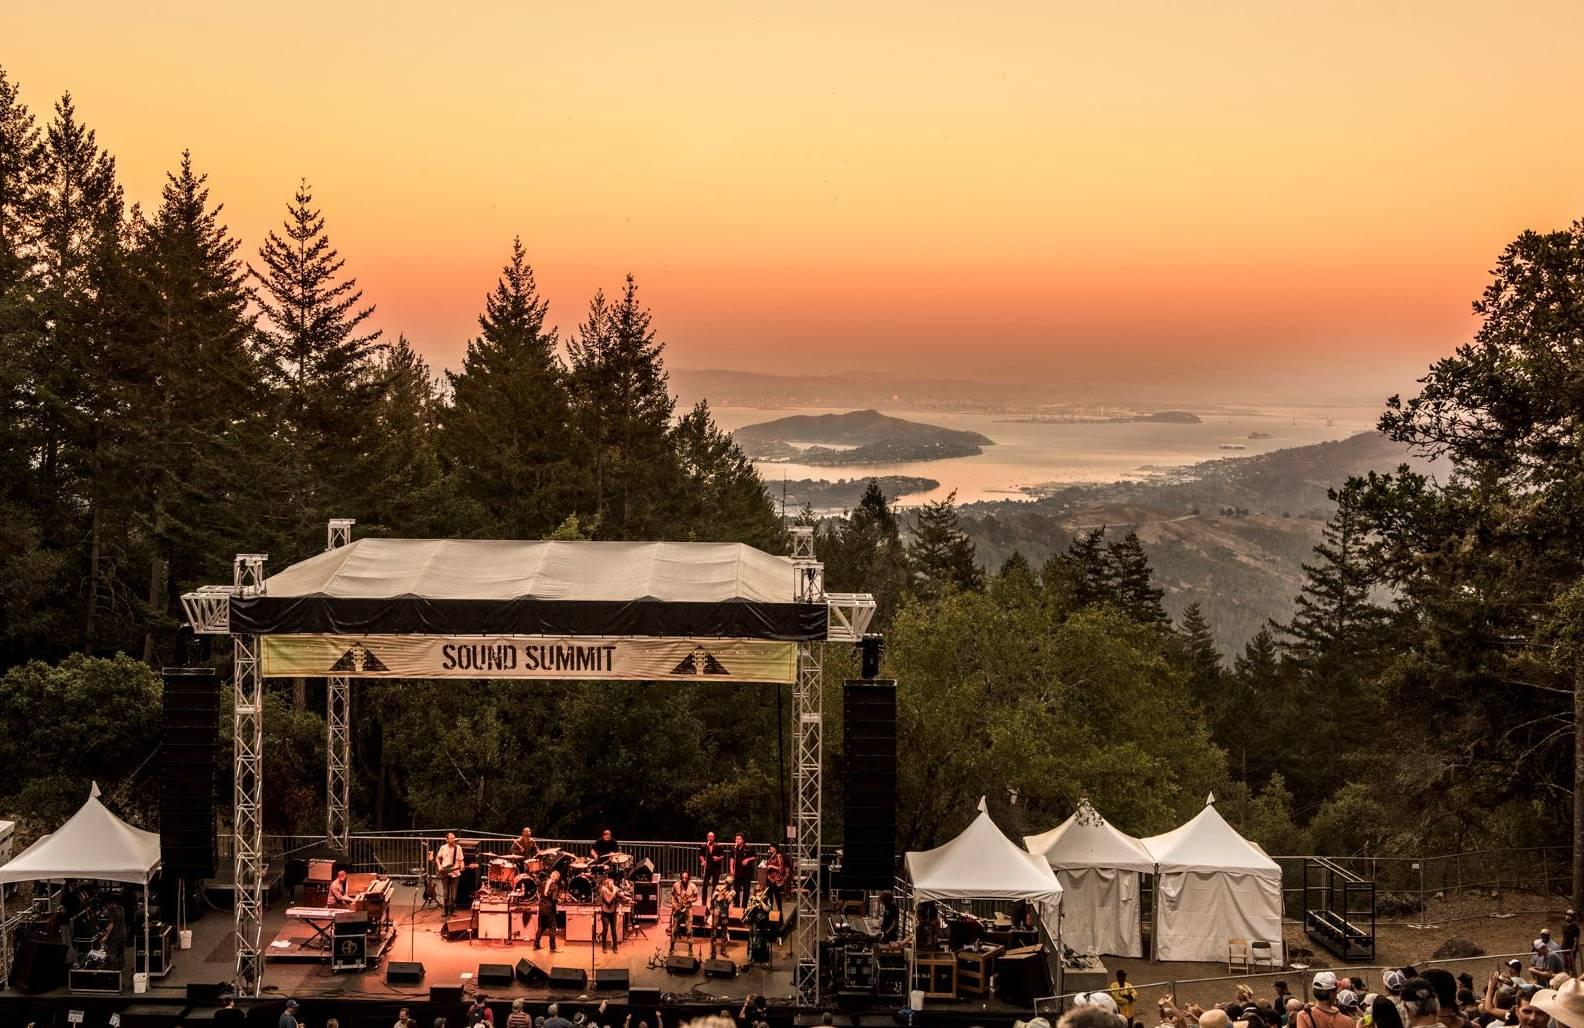 Sound Summit is a concert at the Mountain Theater on Mt. Tamalpais